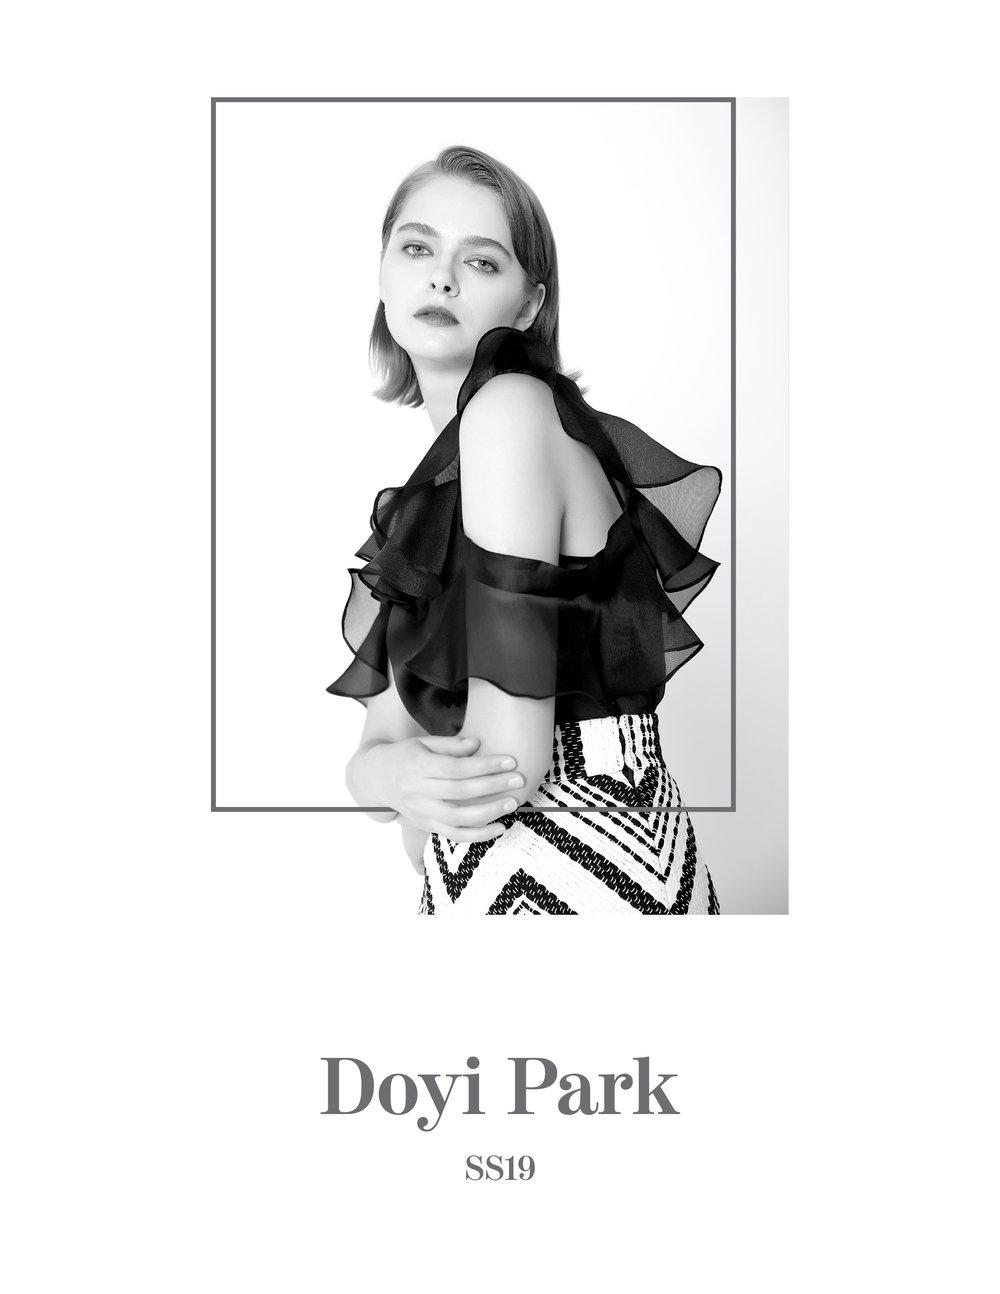 Doyi Park ss19 cover.jpg